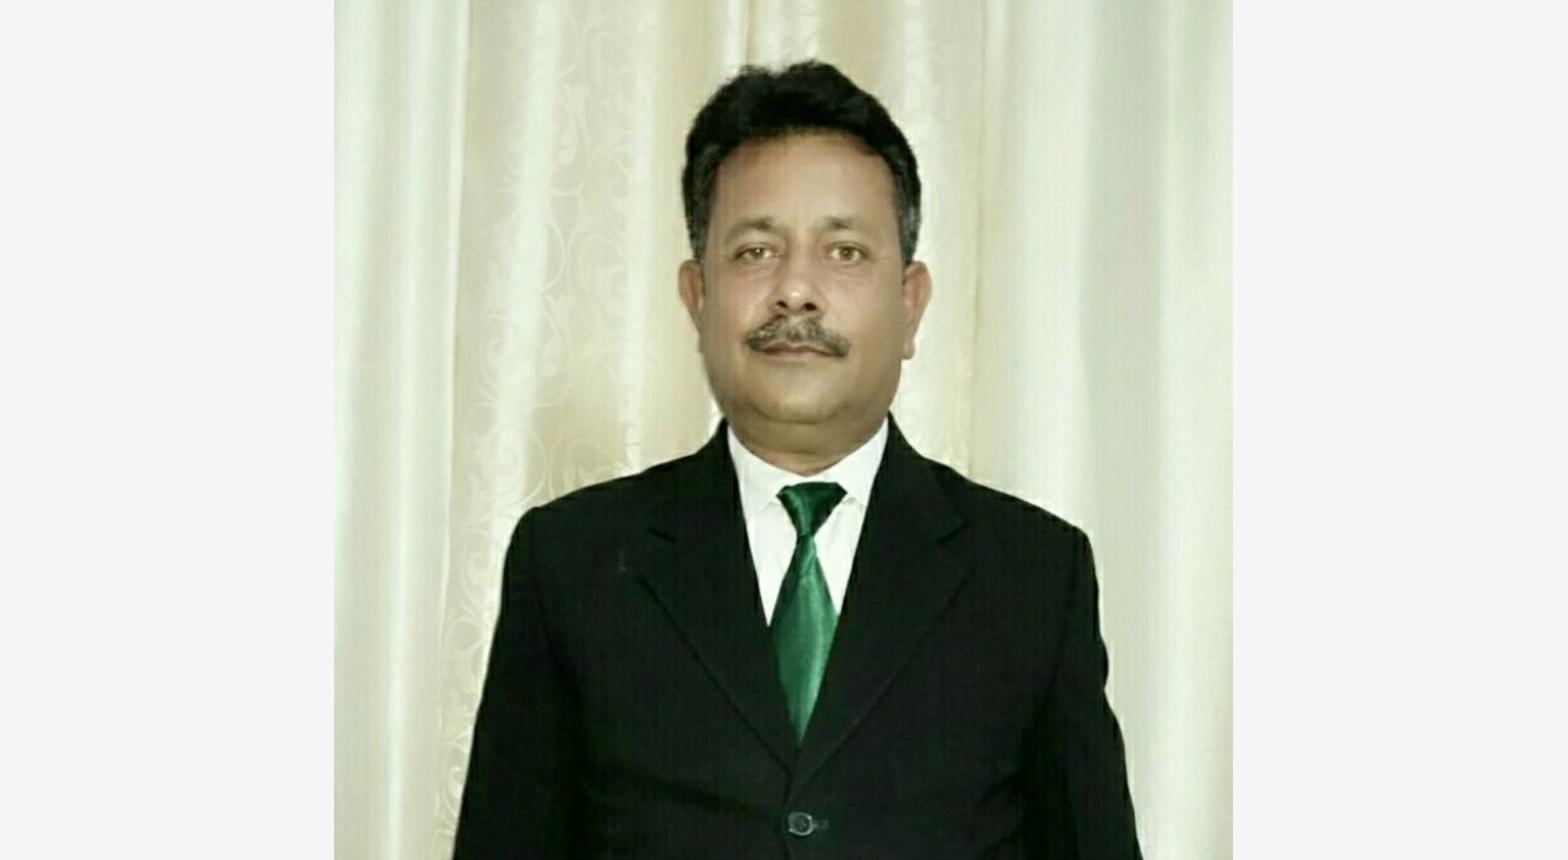 Raghvendra Pratap Tripathi